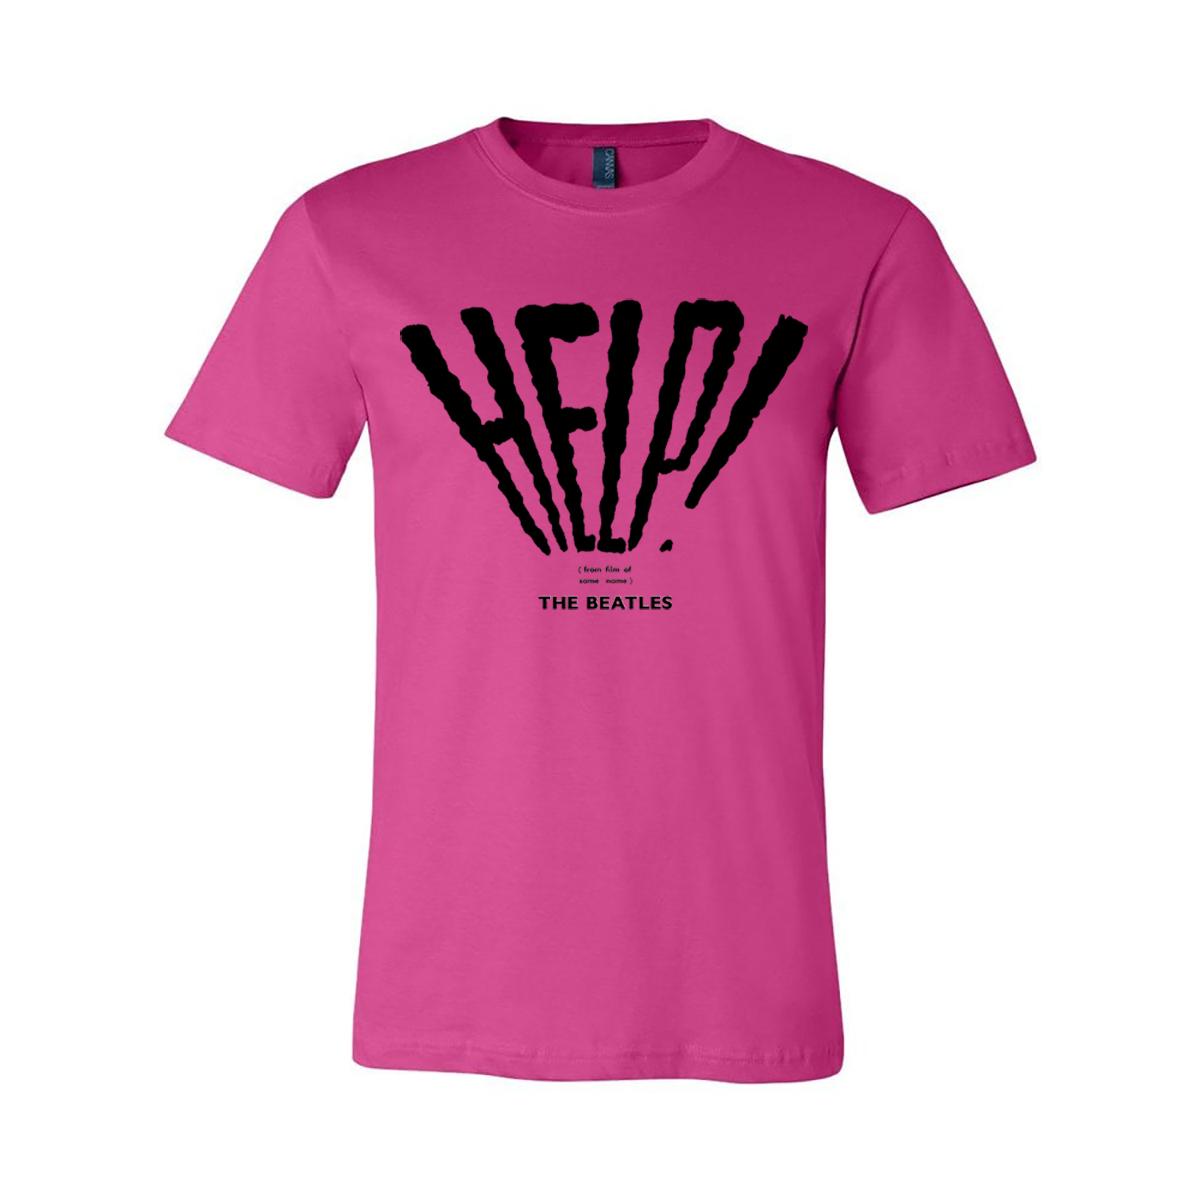 Help! / I'm Down Pink Tee